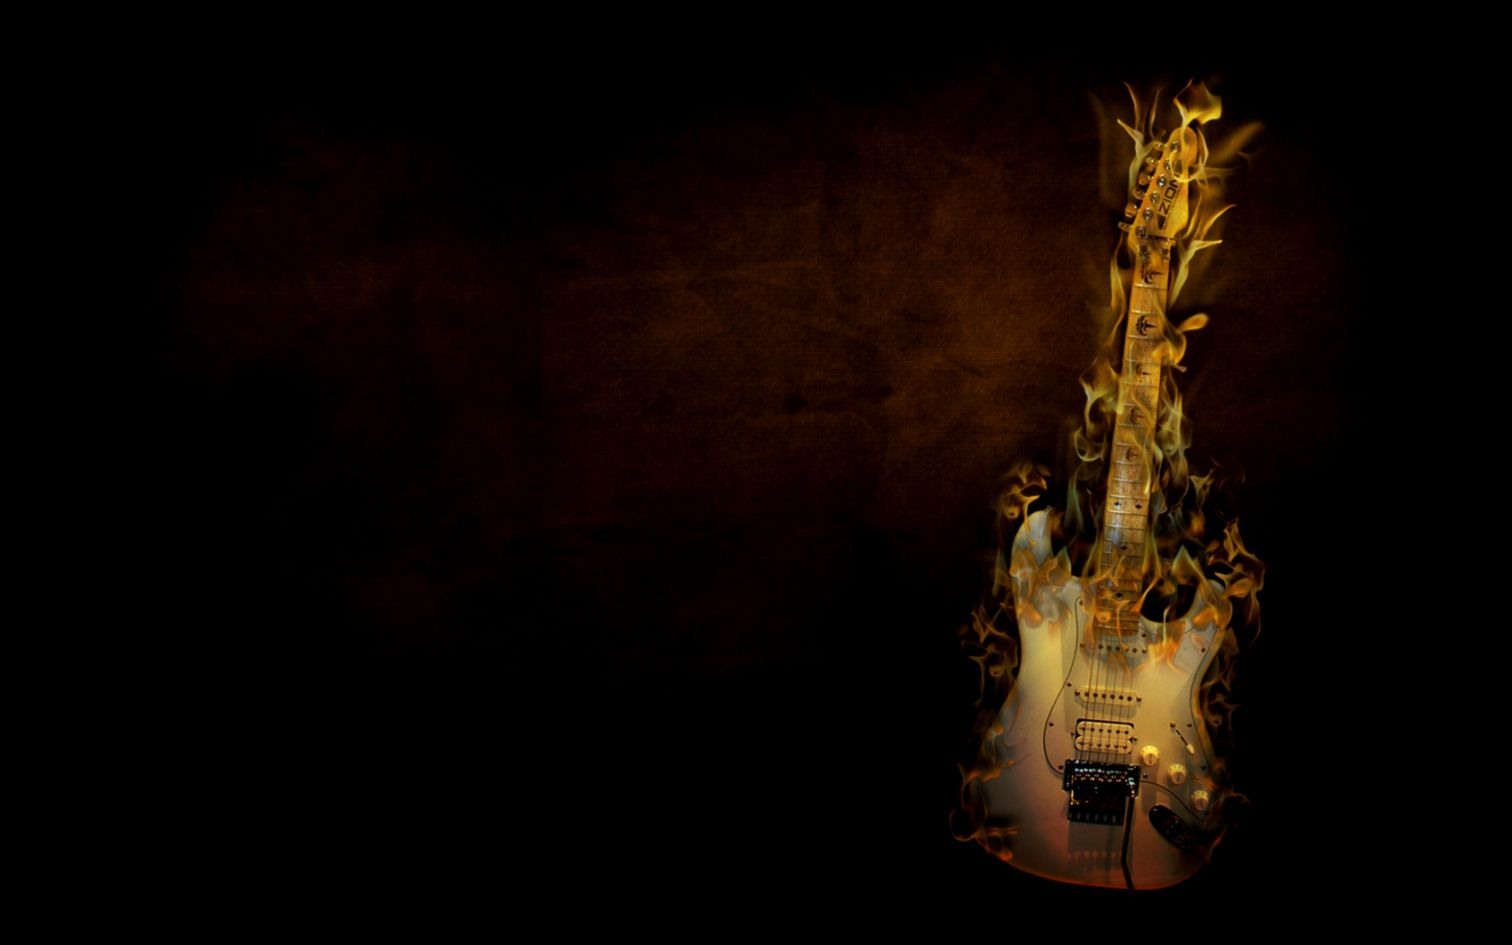 Good Wallpaper Music Skull - download-fire-skull-3d-wallpaper-music-hd-desktop-mobile-free  Collection_705975.jpg